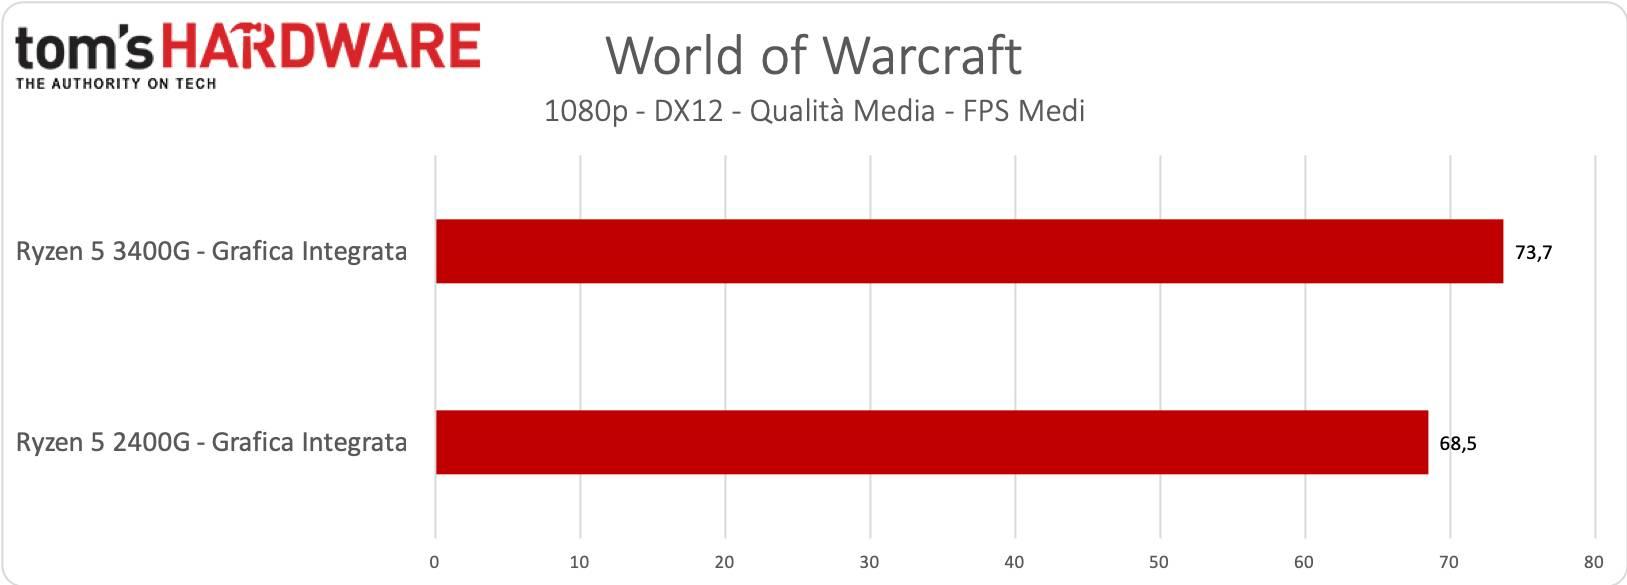 Ryzen 5 3400 - Grafica Integrata - World of Warcraft